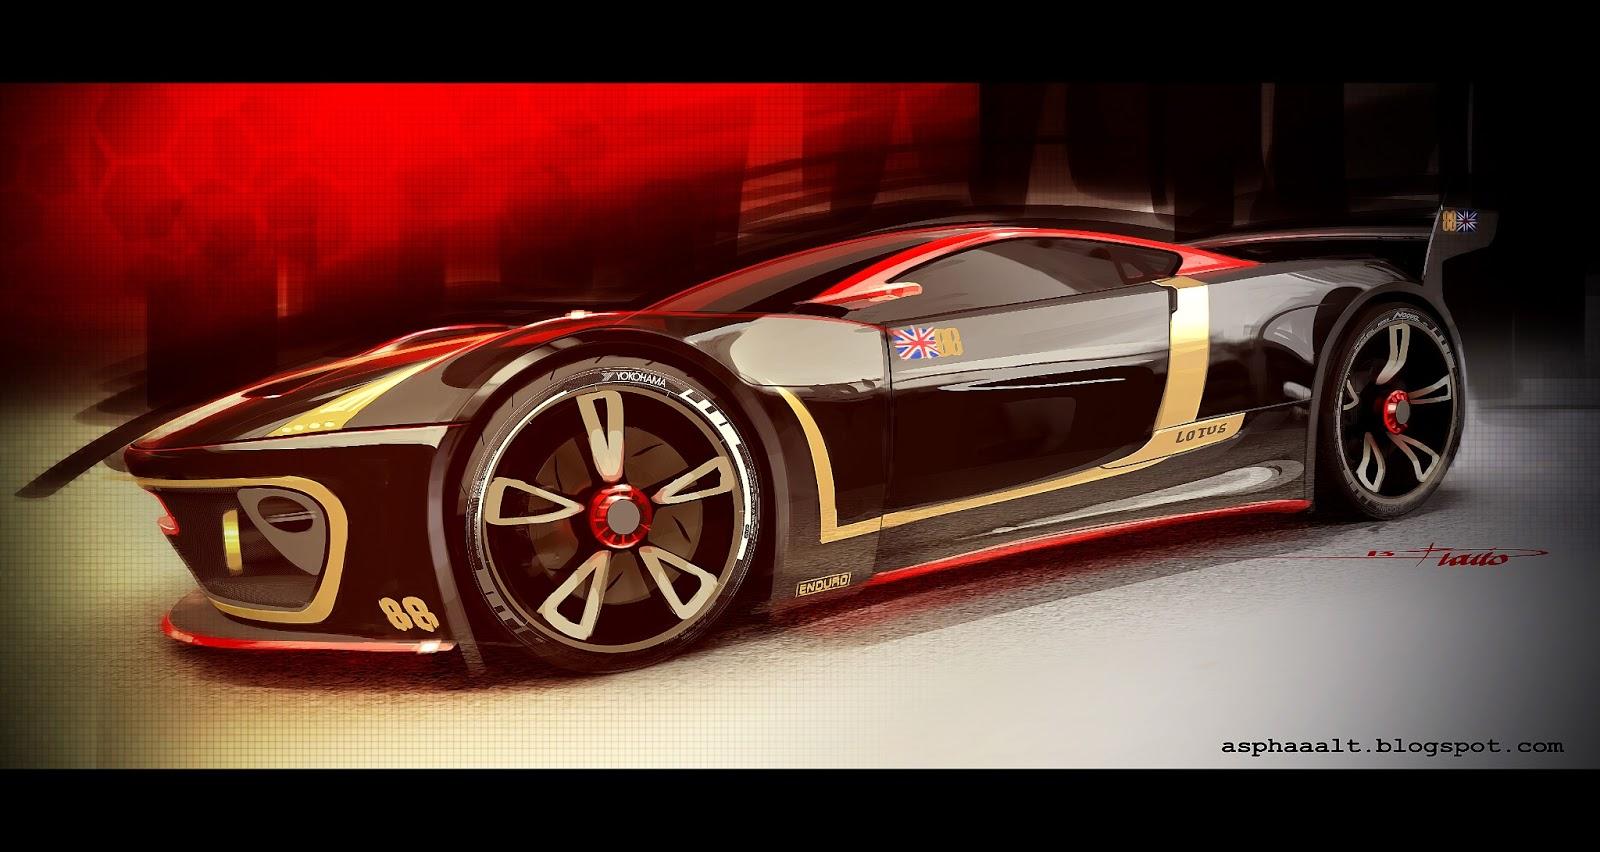 astonishing lotus car concept - lotustalk - the lotus cars community